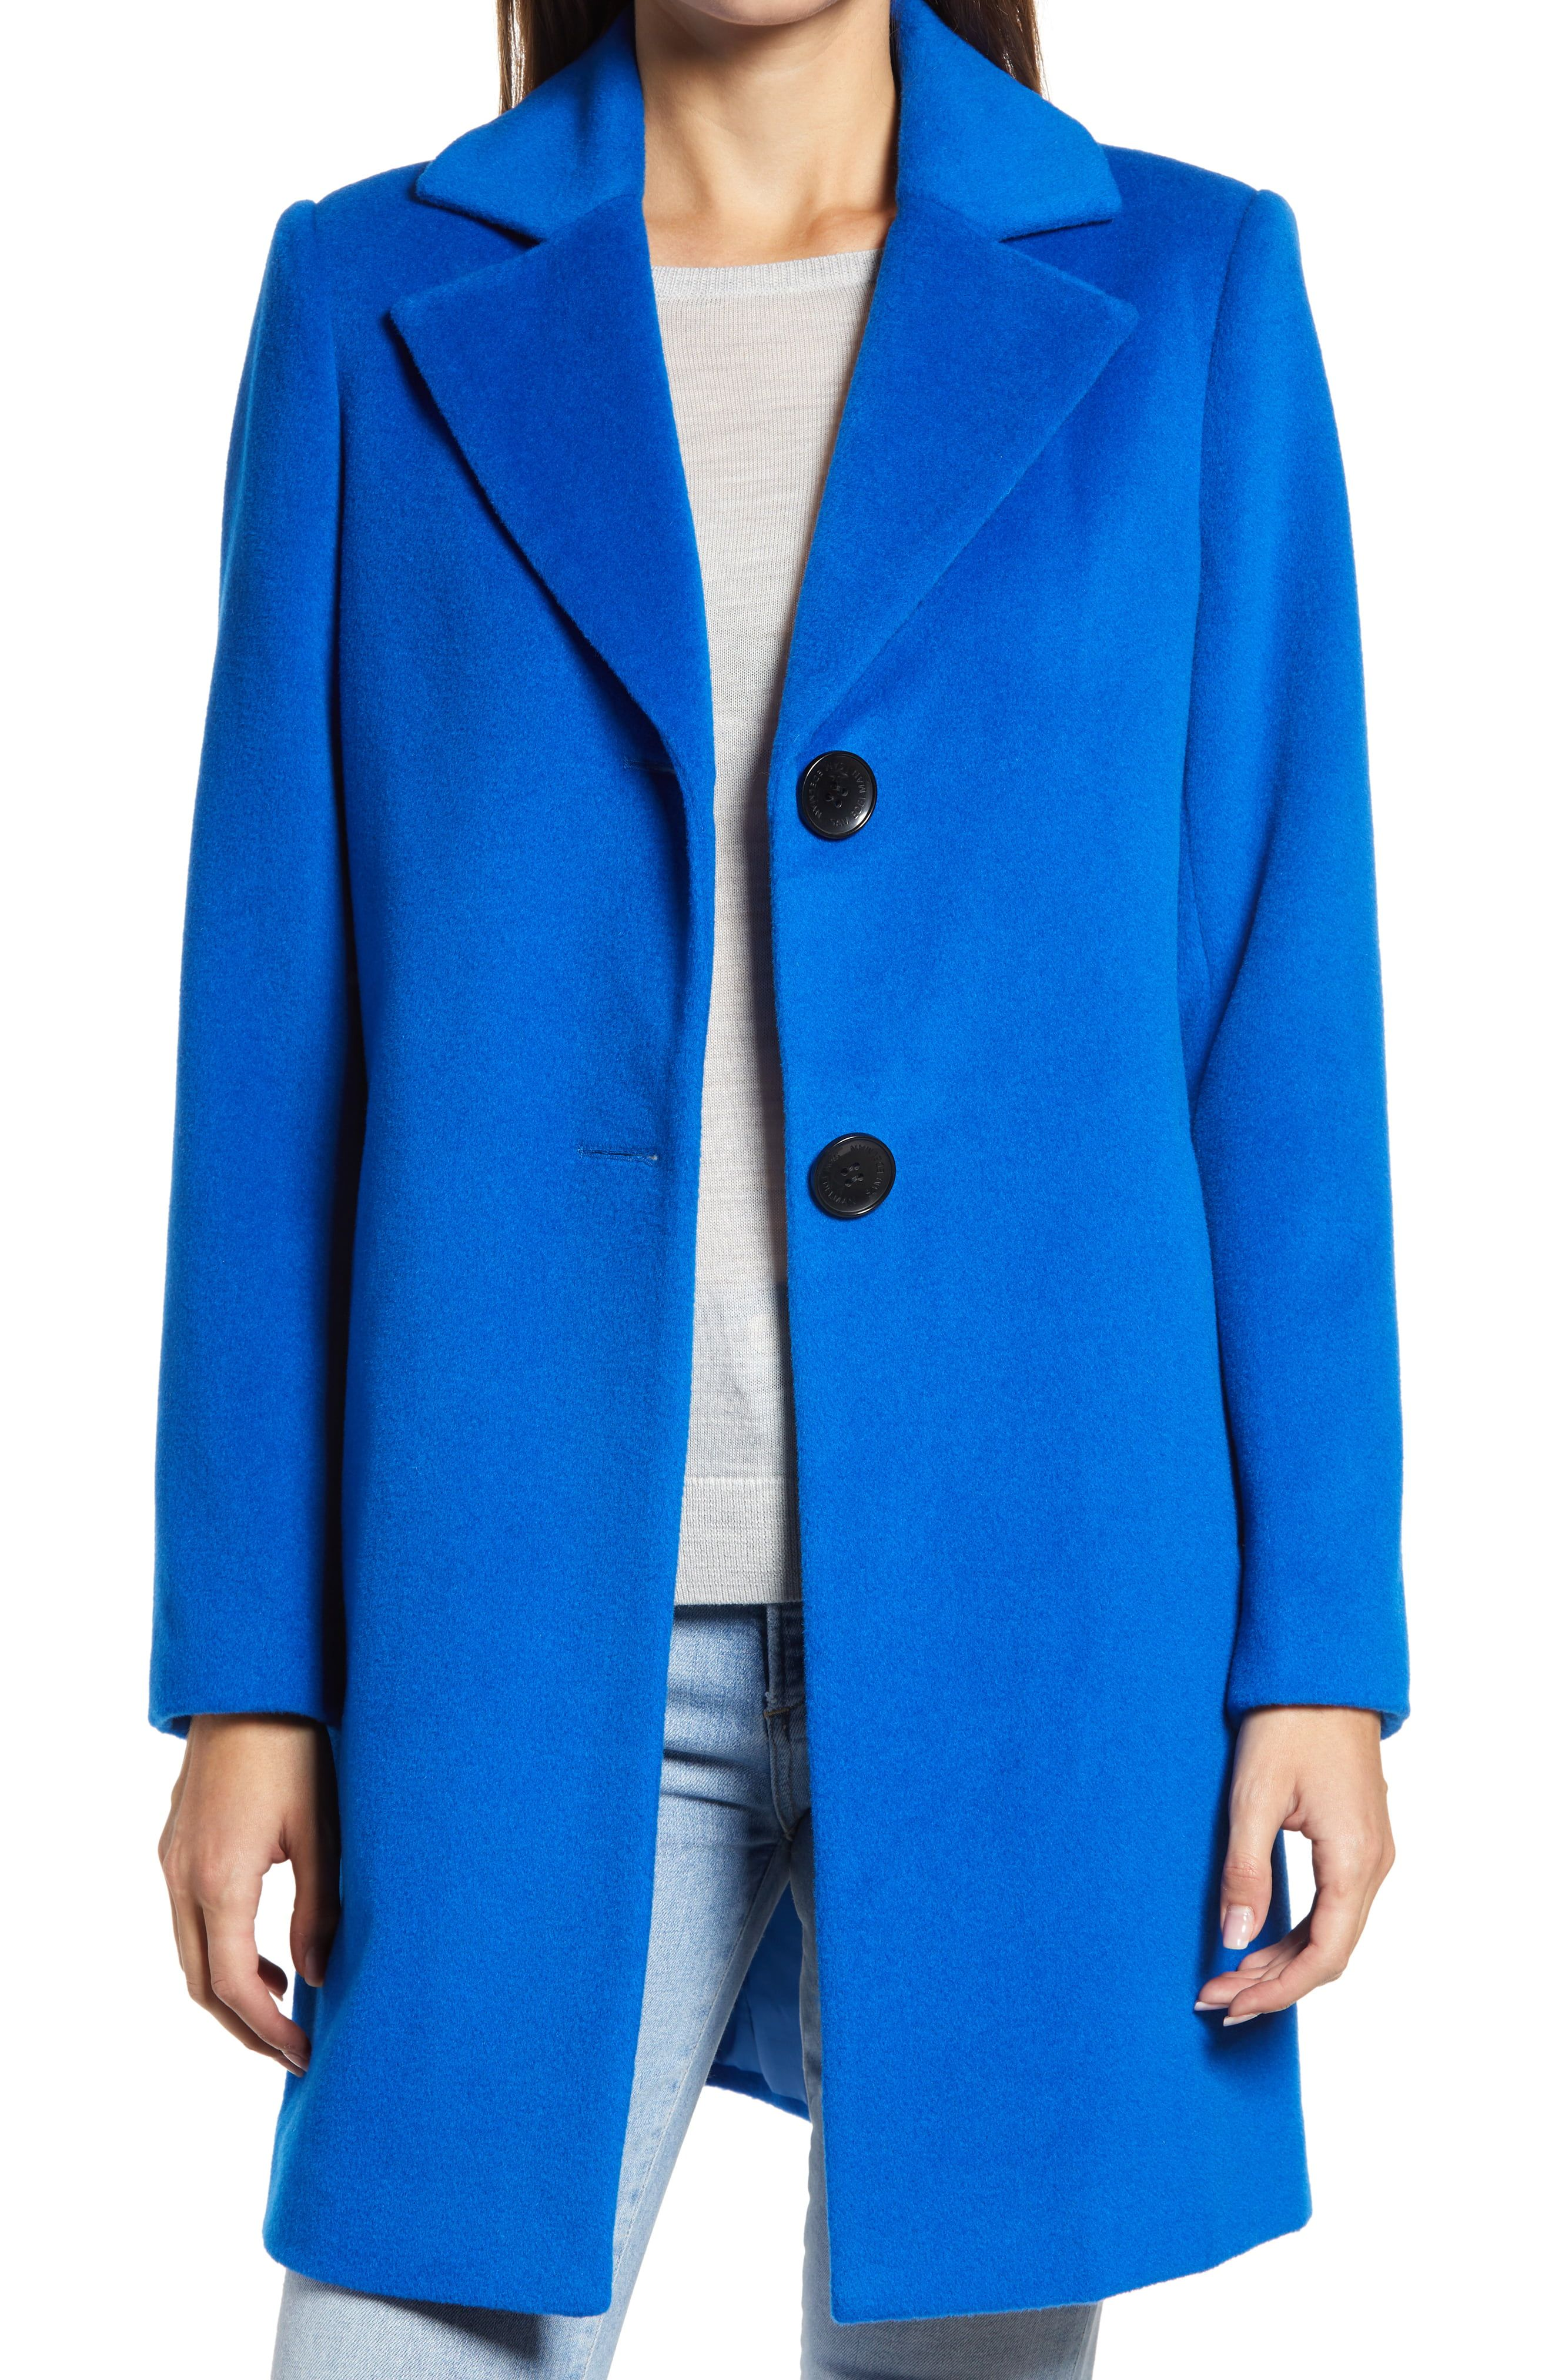 Sam Edelman Wool Blend Coat Nordstrom In 2021 Coat Single Breasted Coat Sam Edelman [ 4048 x 2640 Pixel ]